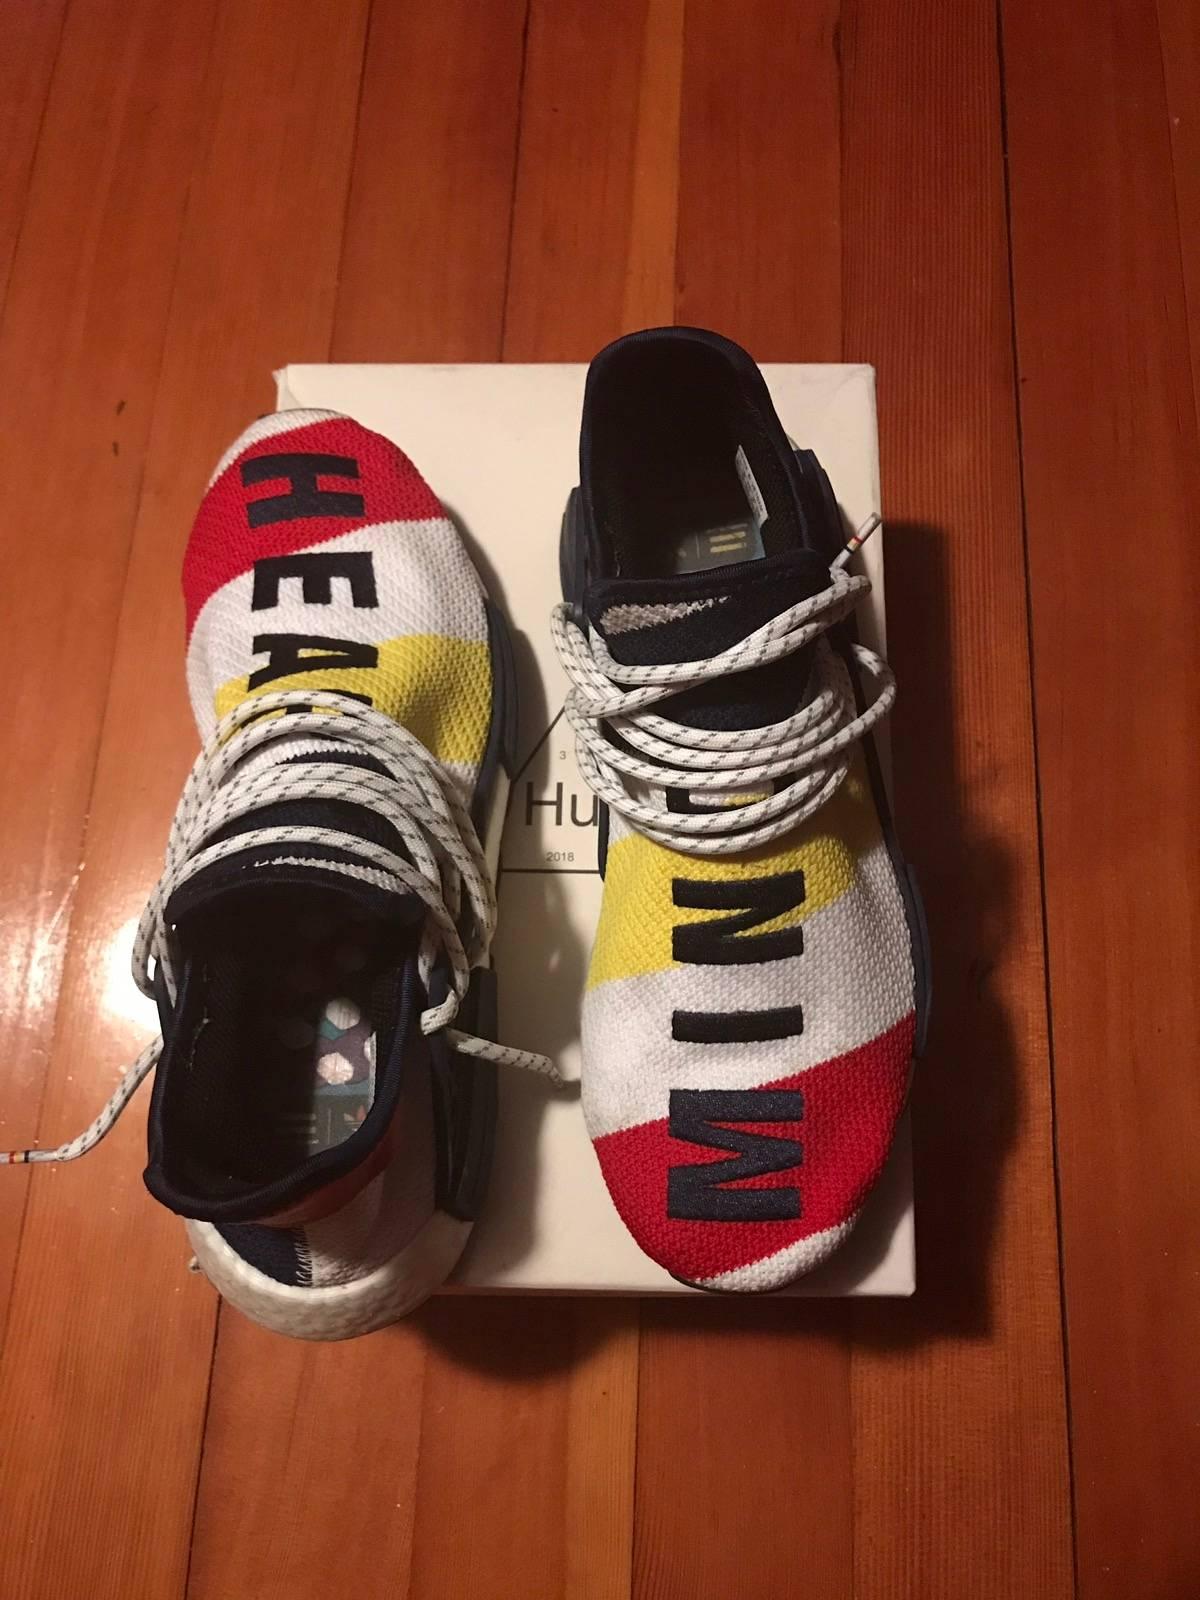 finest selection 2dc85 bb39c Adidas × Billionaire Boys Club × Pharrell Human Race Bbc Nmd Size 9.5 $243